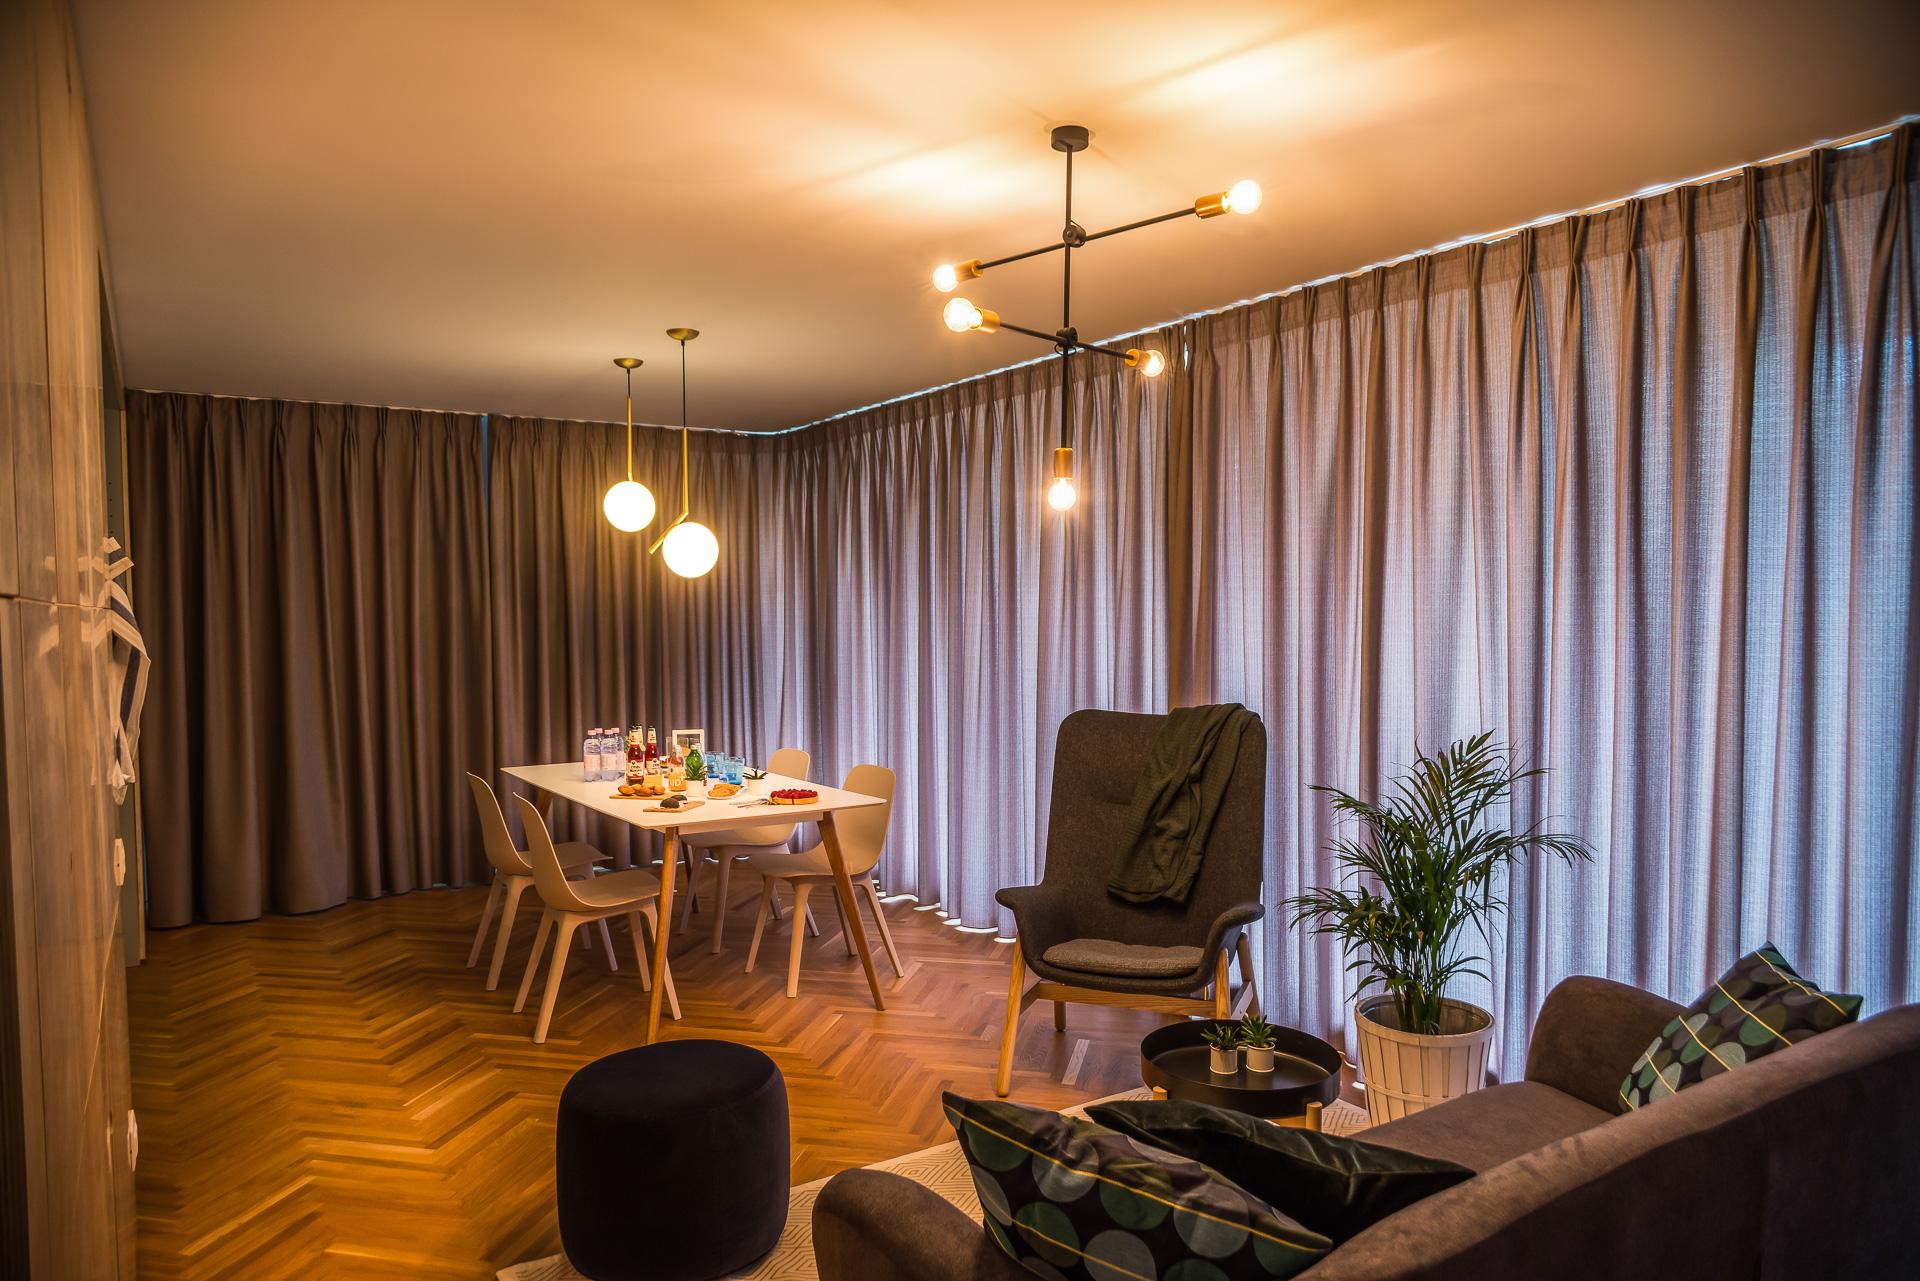 Apartament, Amenajare, Sine & Draperii